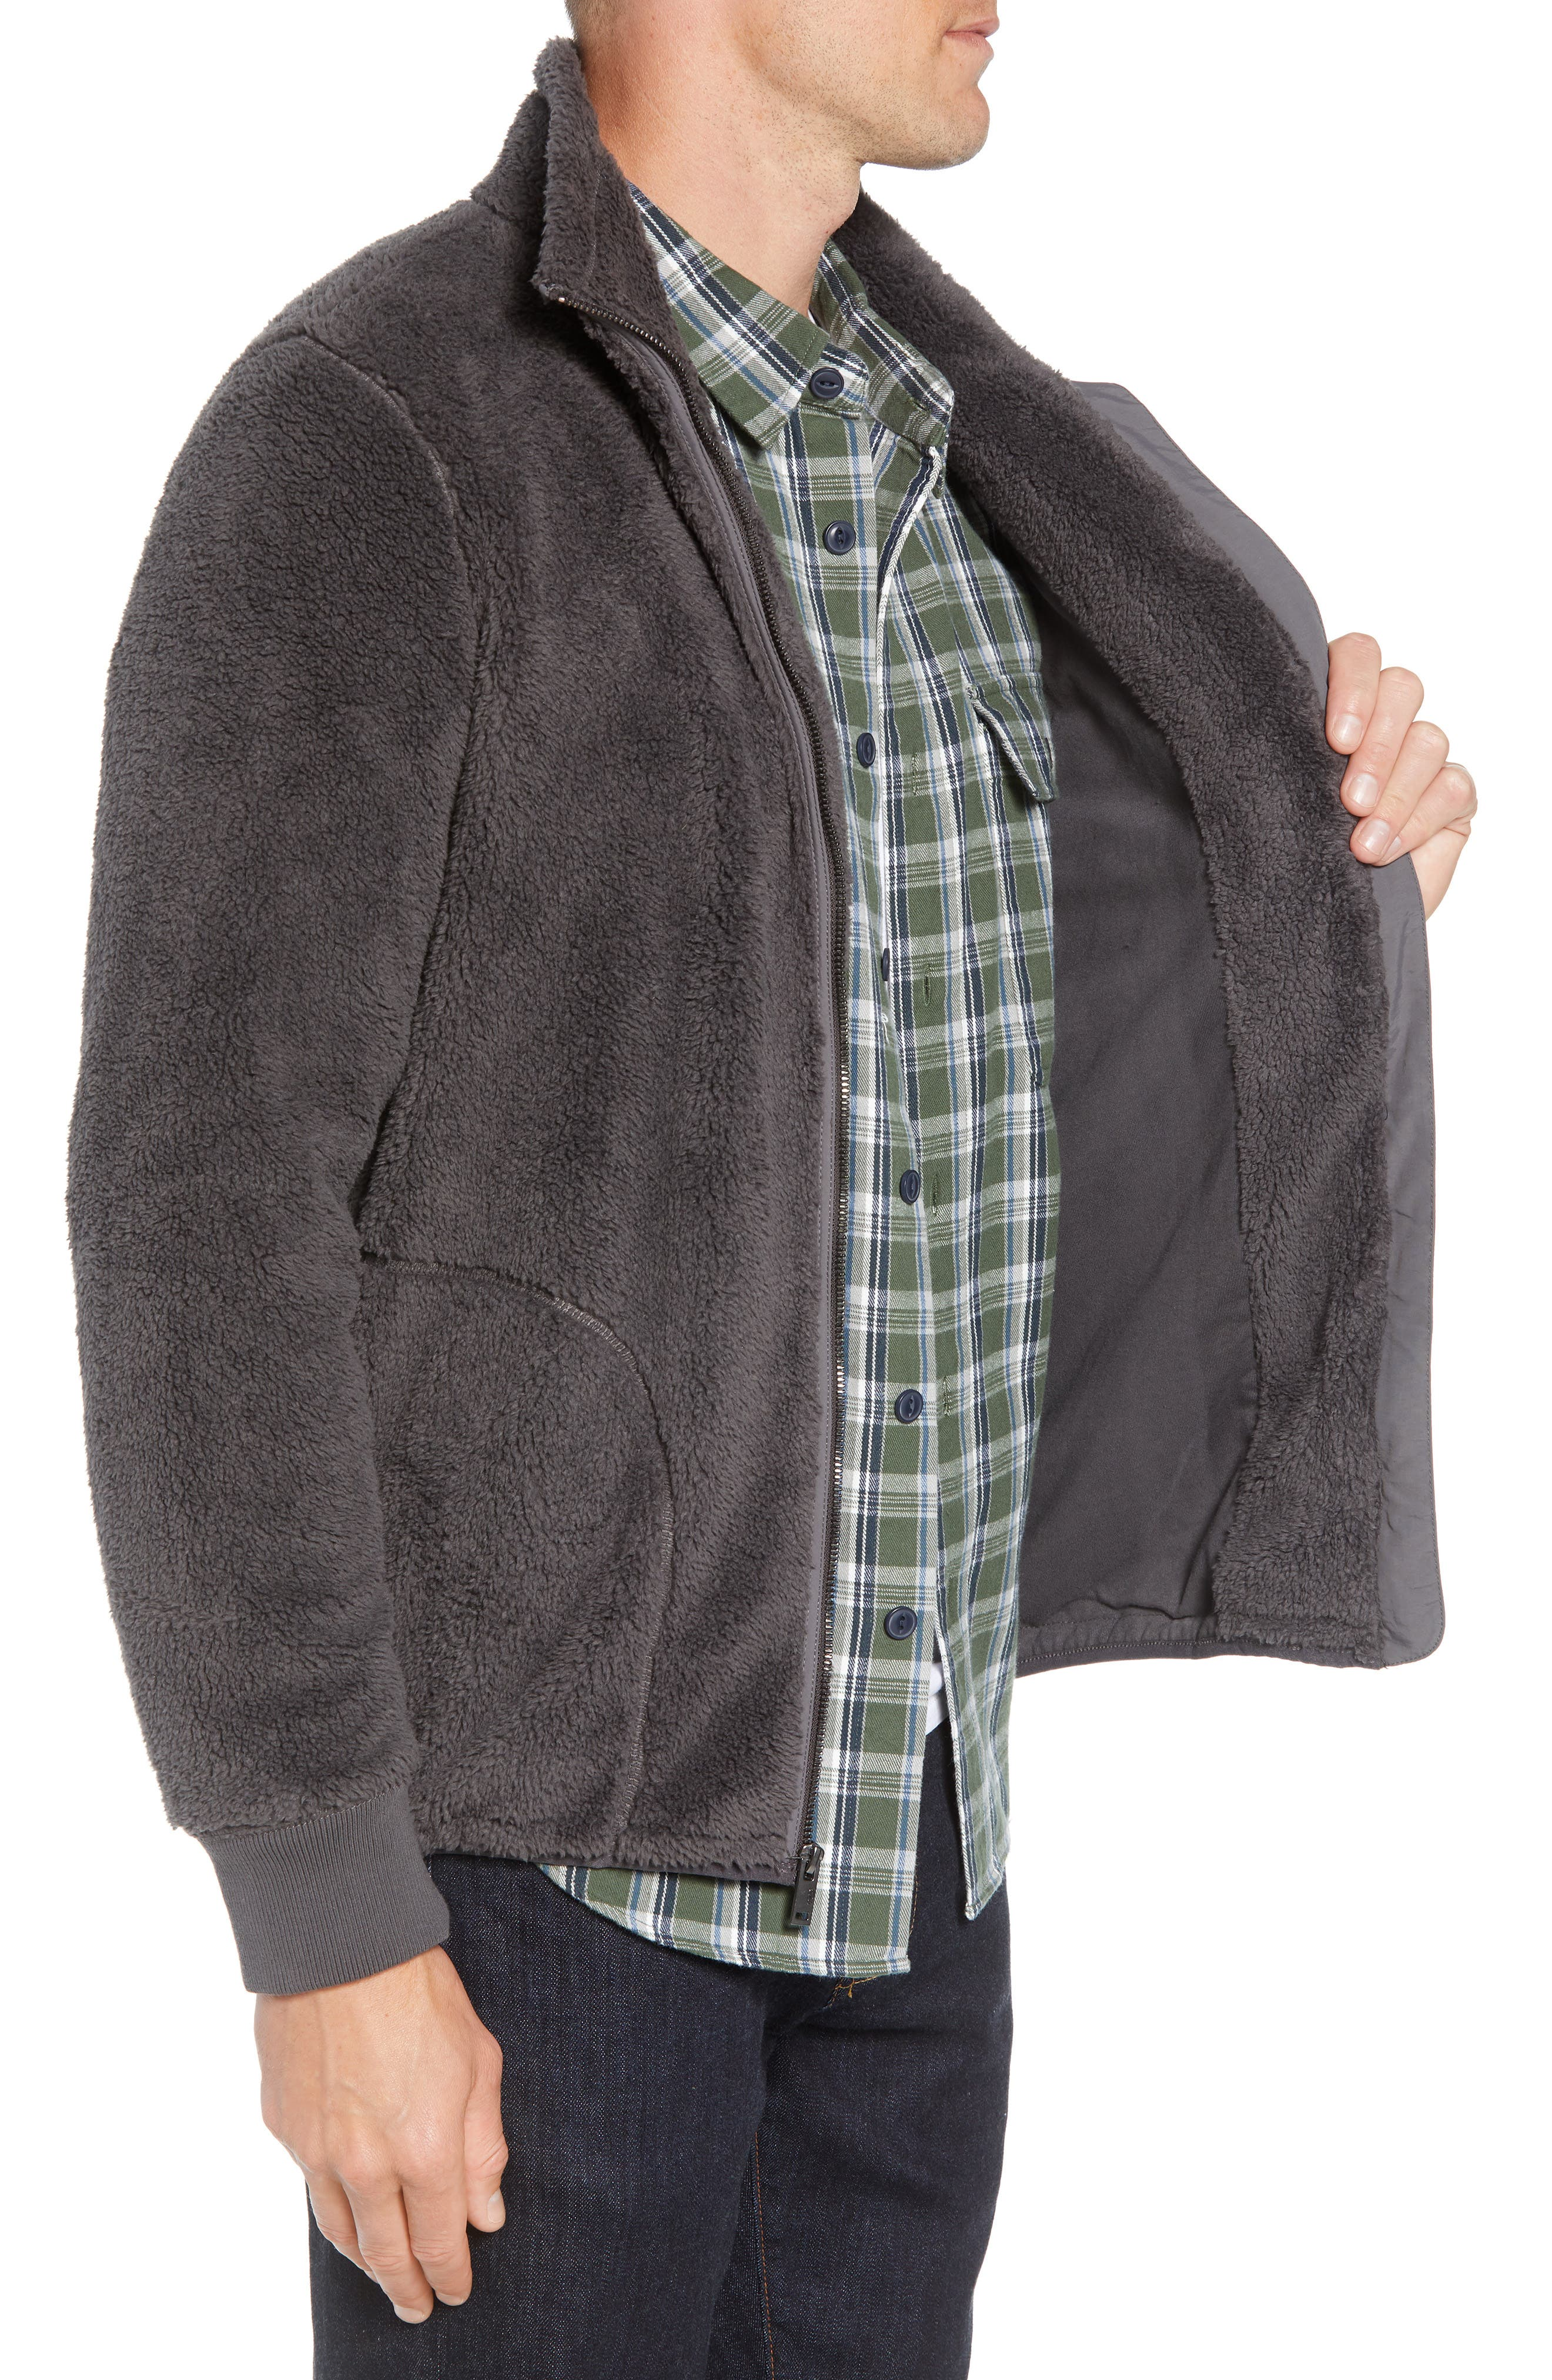 UGG<SUP>®</SUP>, Lucas High Pile Fleece Sweater Jacket, Alternate thumbnail 4, color, CHARCOAL